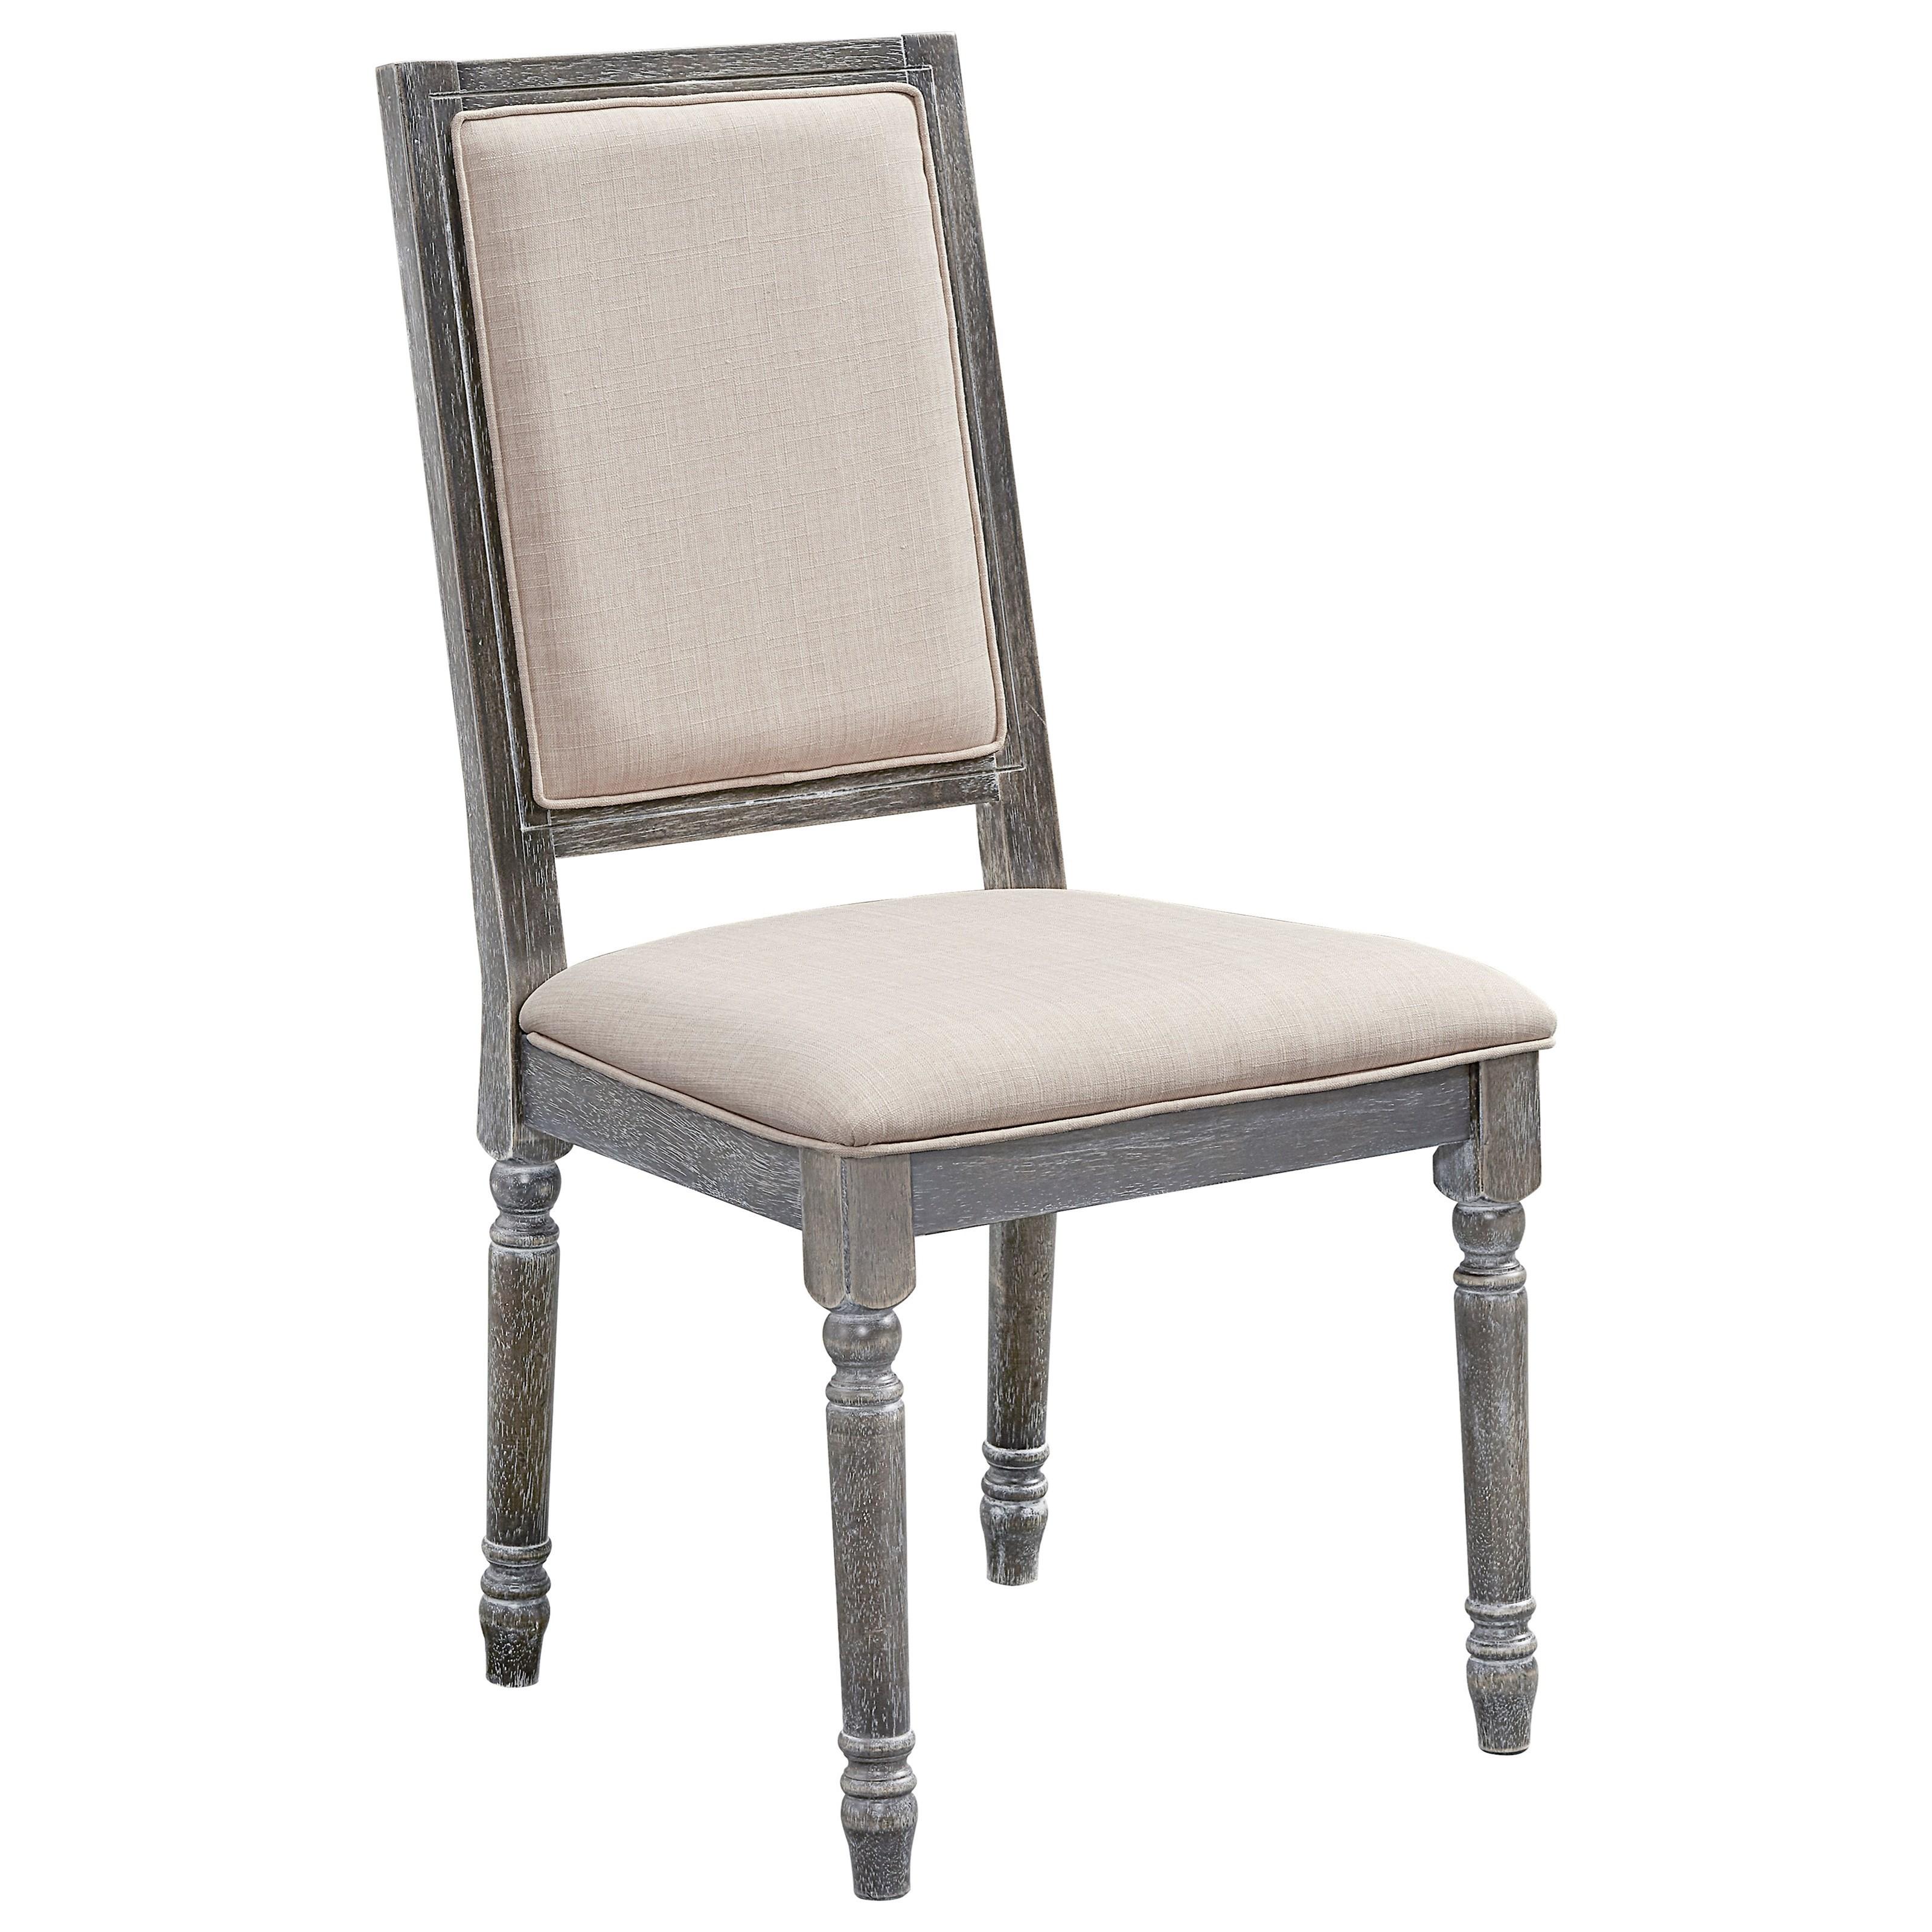 Progressive Furniture Muses Upholstered Back Chair - Item Number: P836-65